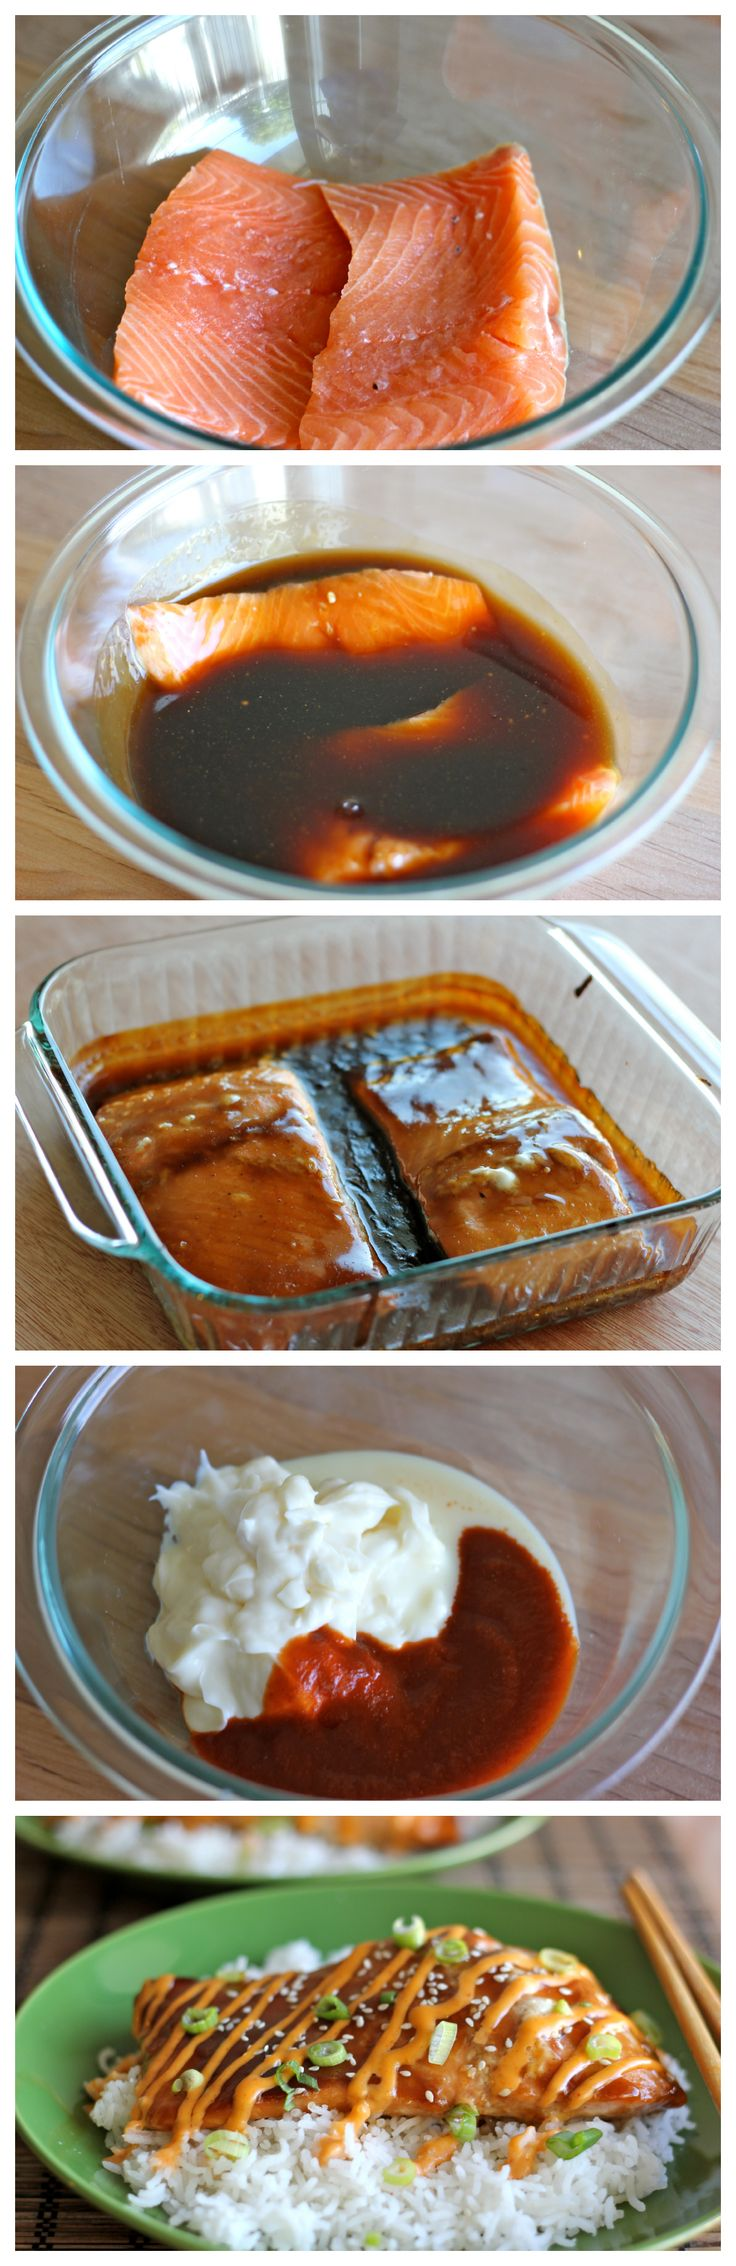 Teriyaki Salmon with Sriracha Cream Sauce // easy and the homemade Sriracha Cream Sauce will knock your socks off via Damn Delicious